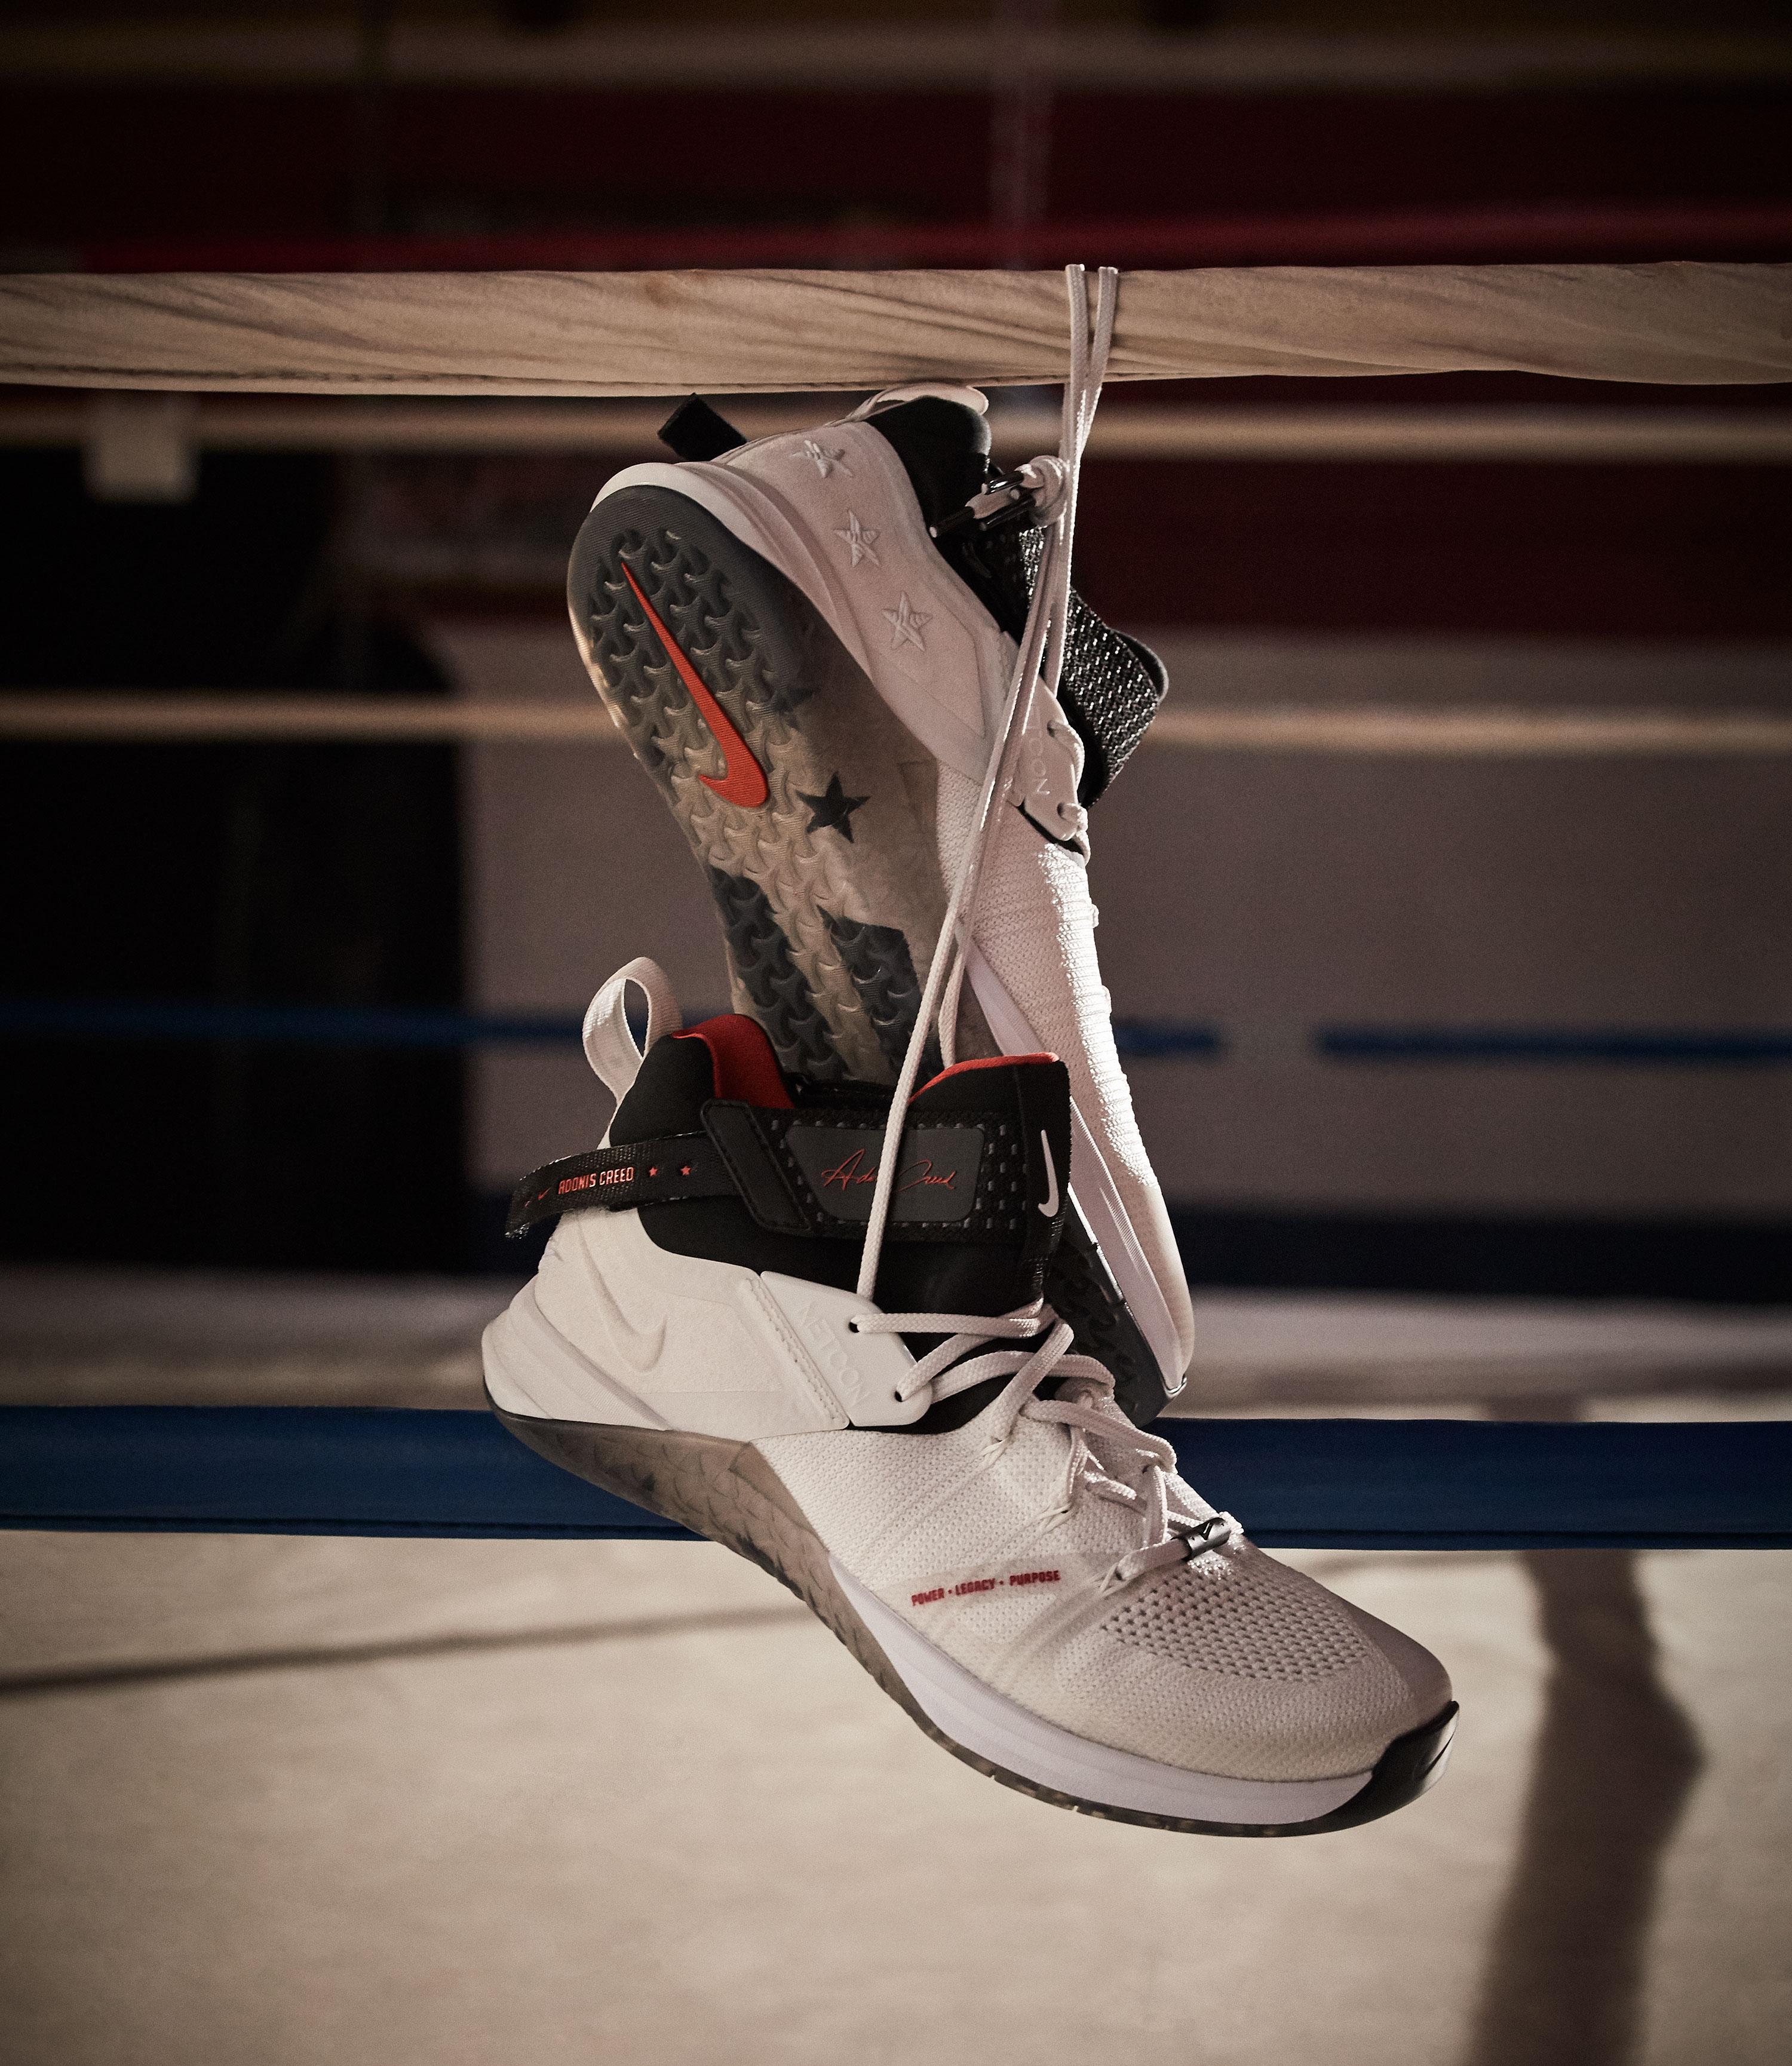 The Nike Training X Adonis Creed